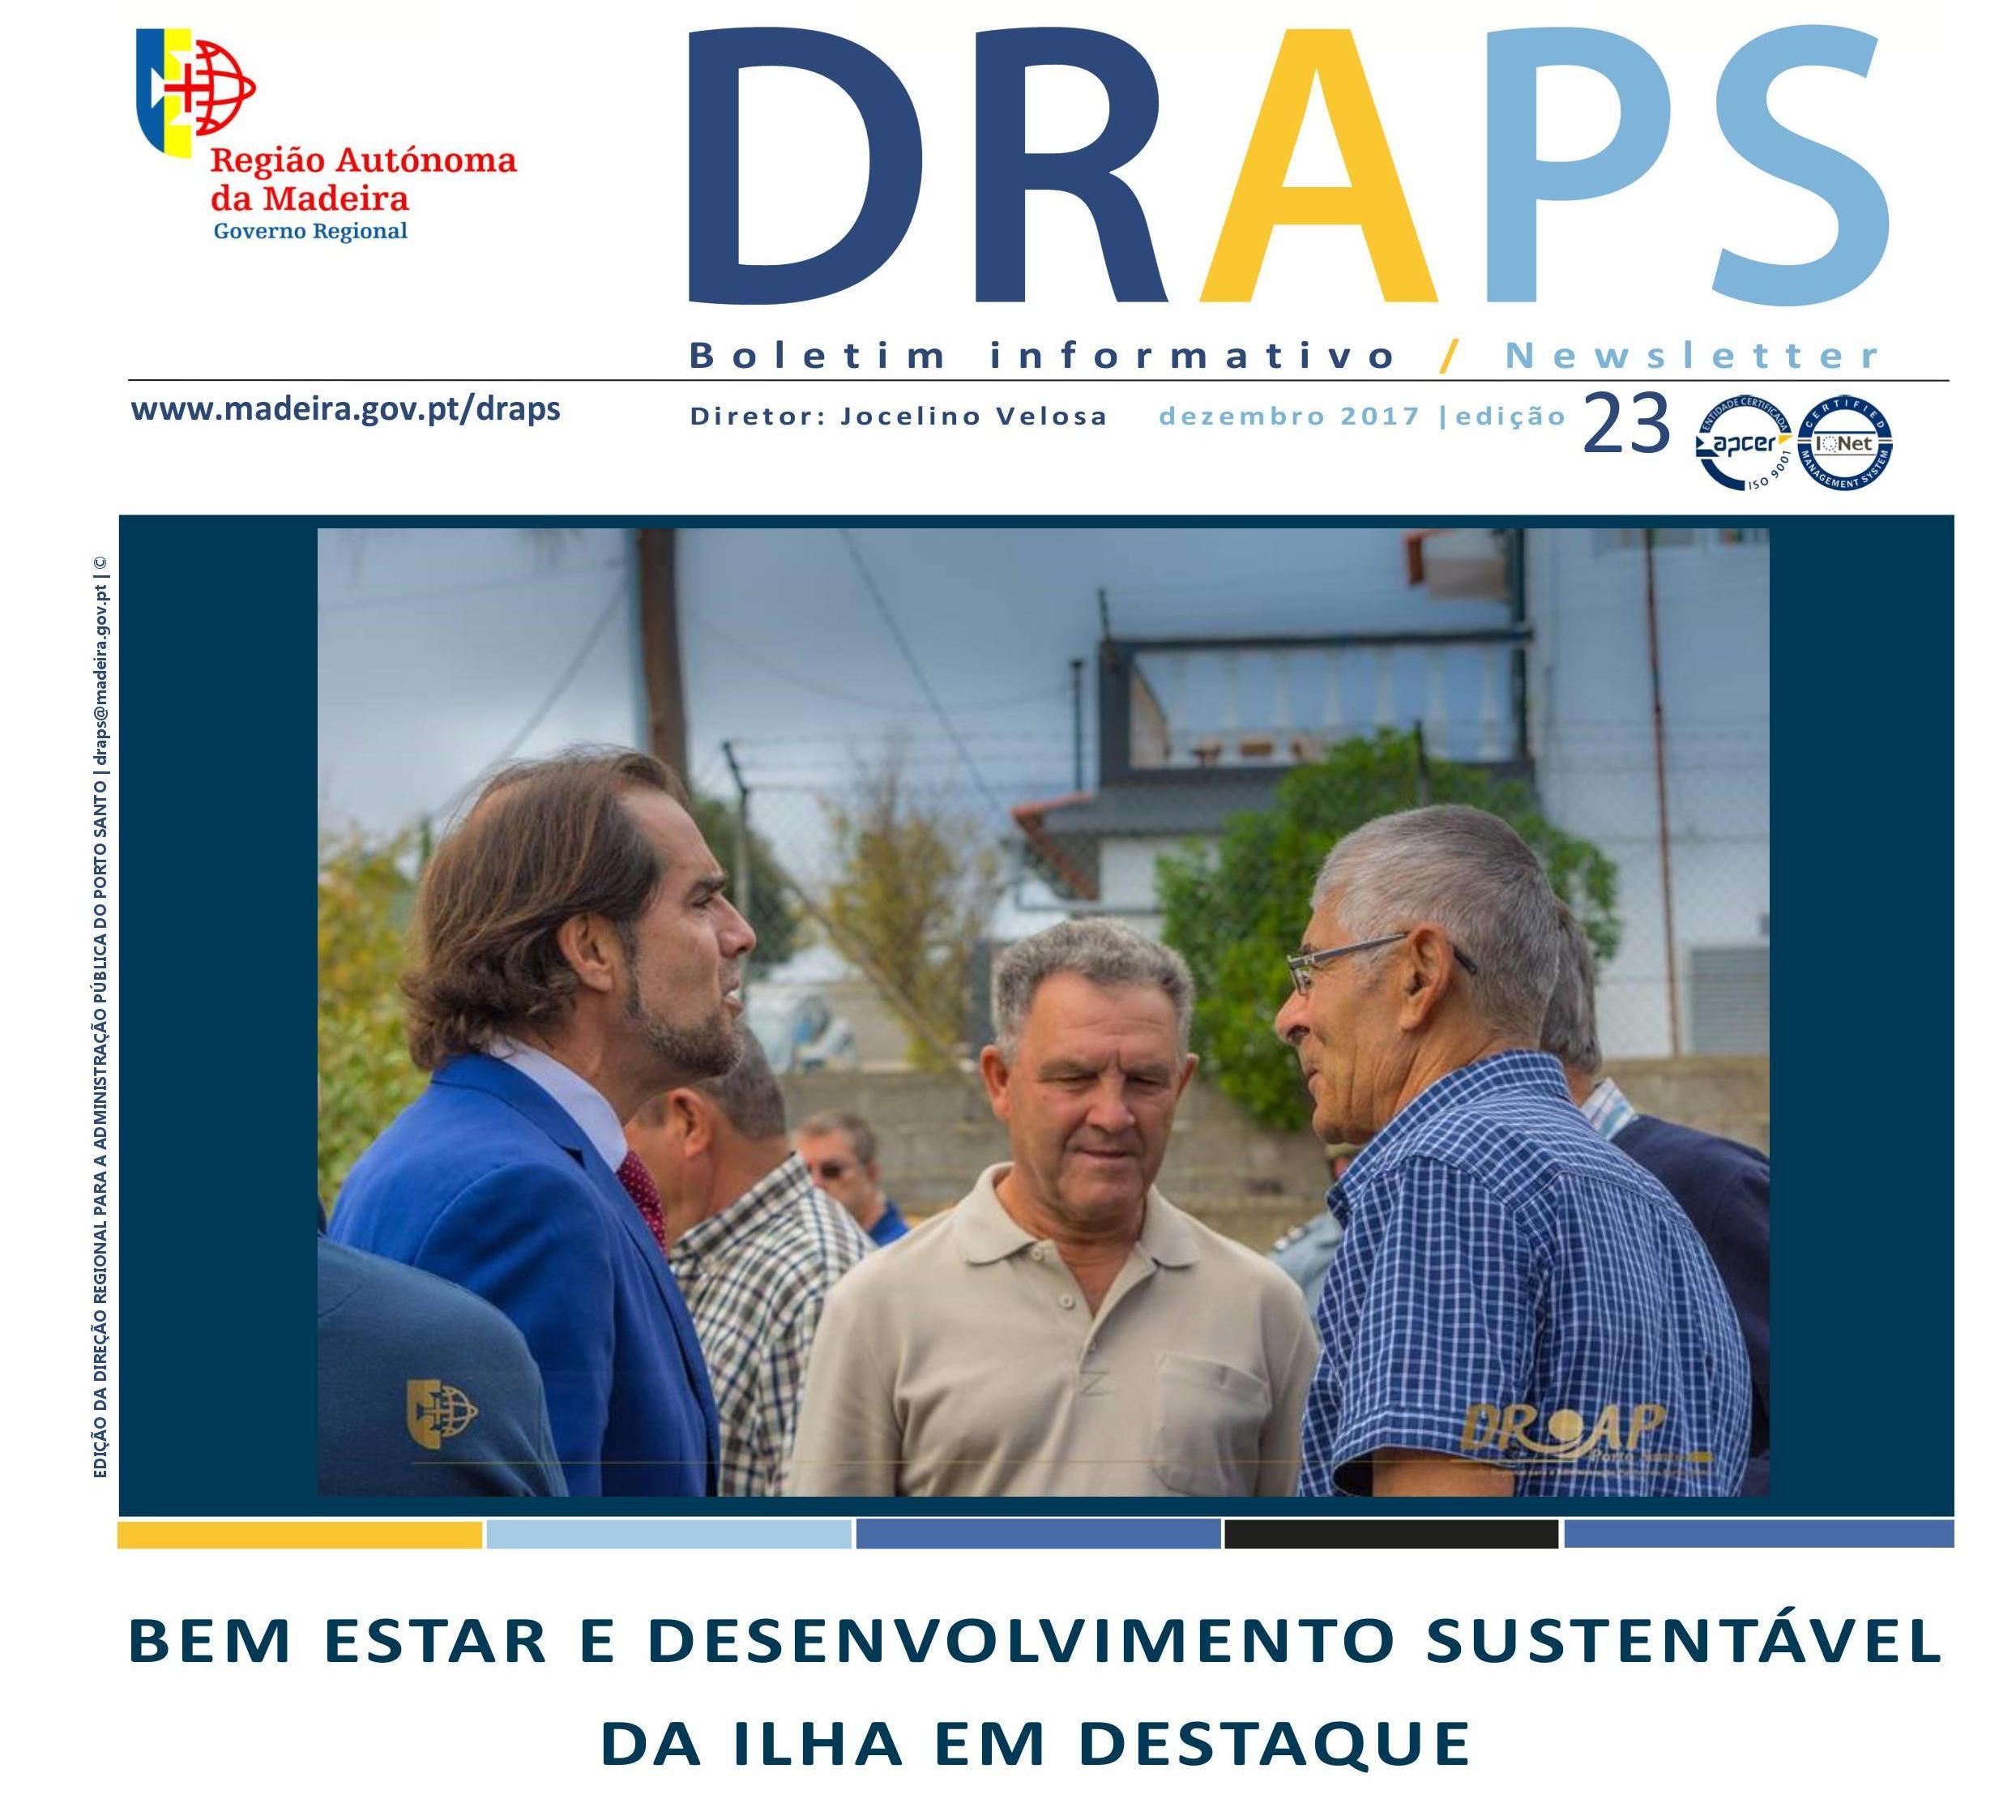 Boletim Informativo / Newsletter n.º 23